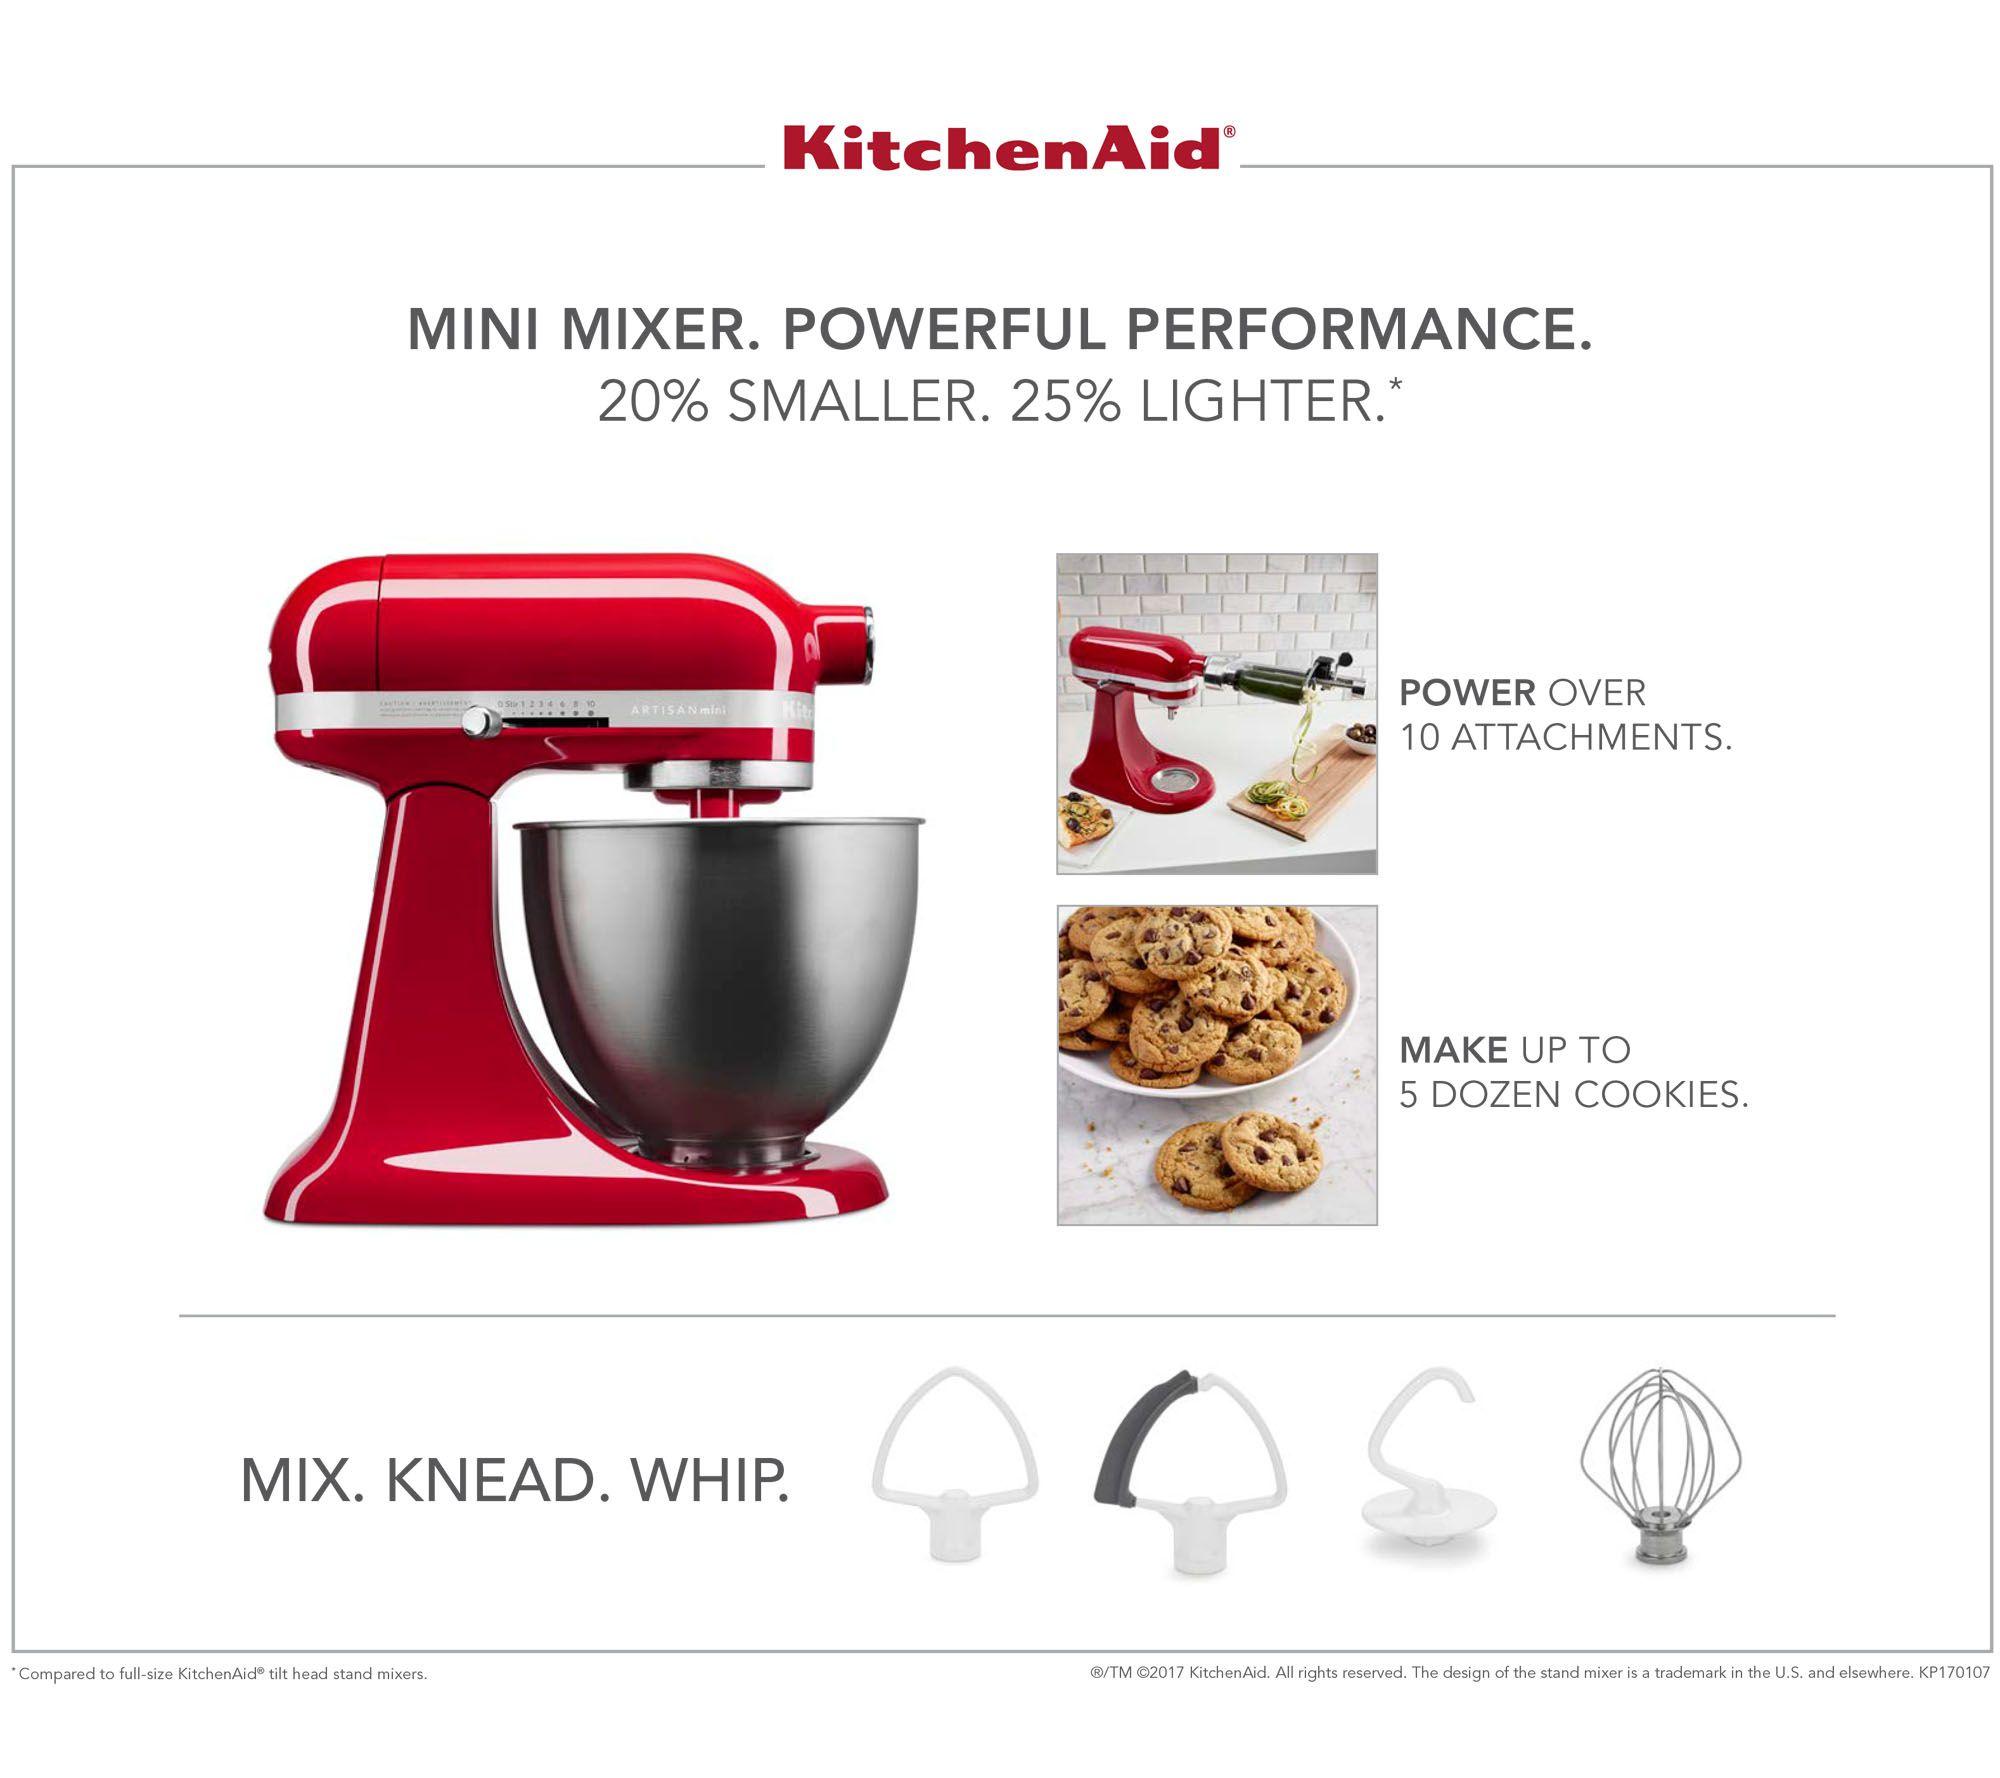 Awe Inspiring Kitchenaid 3 5Qt Artisan Stand Mixer With Flex Edge Beater Qvc Com Home Interior And Landscaping Palasignezvosmurscom